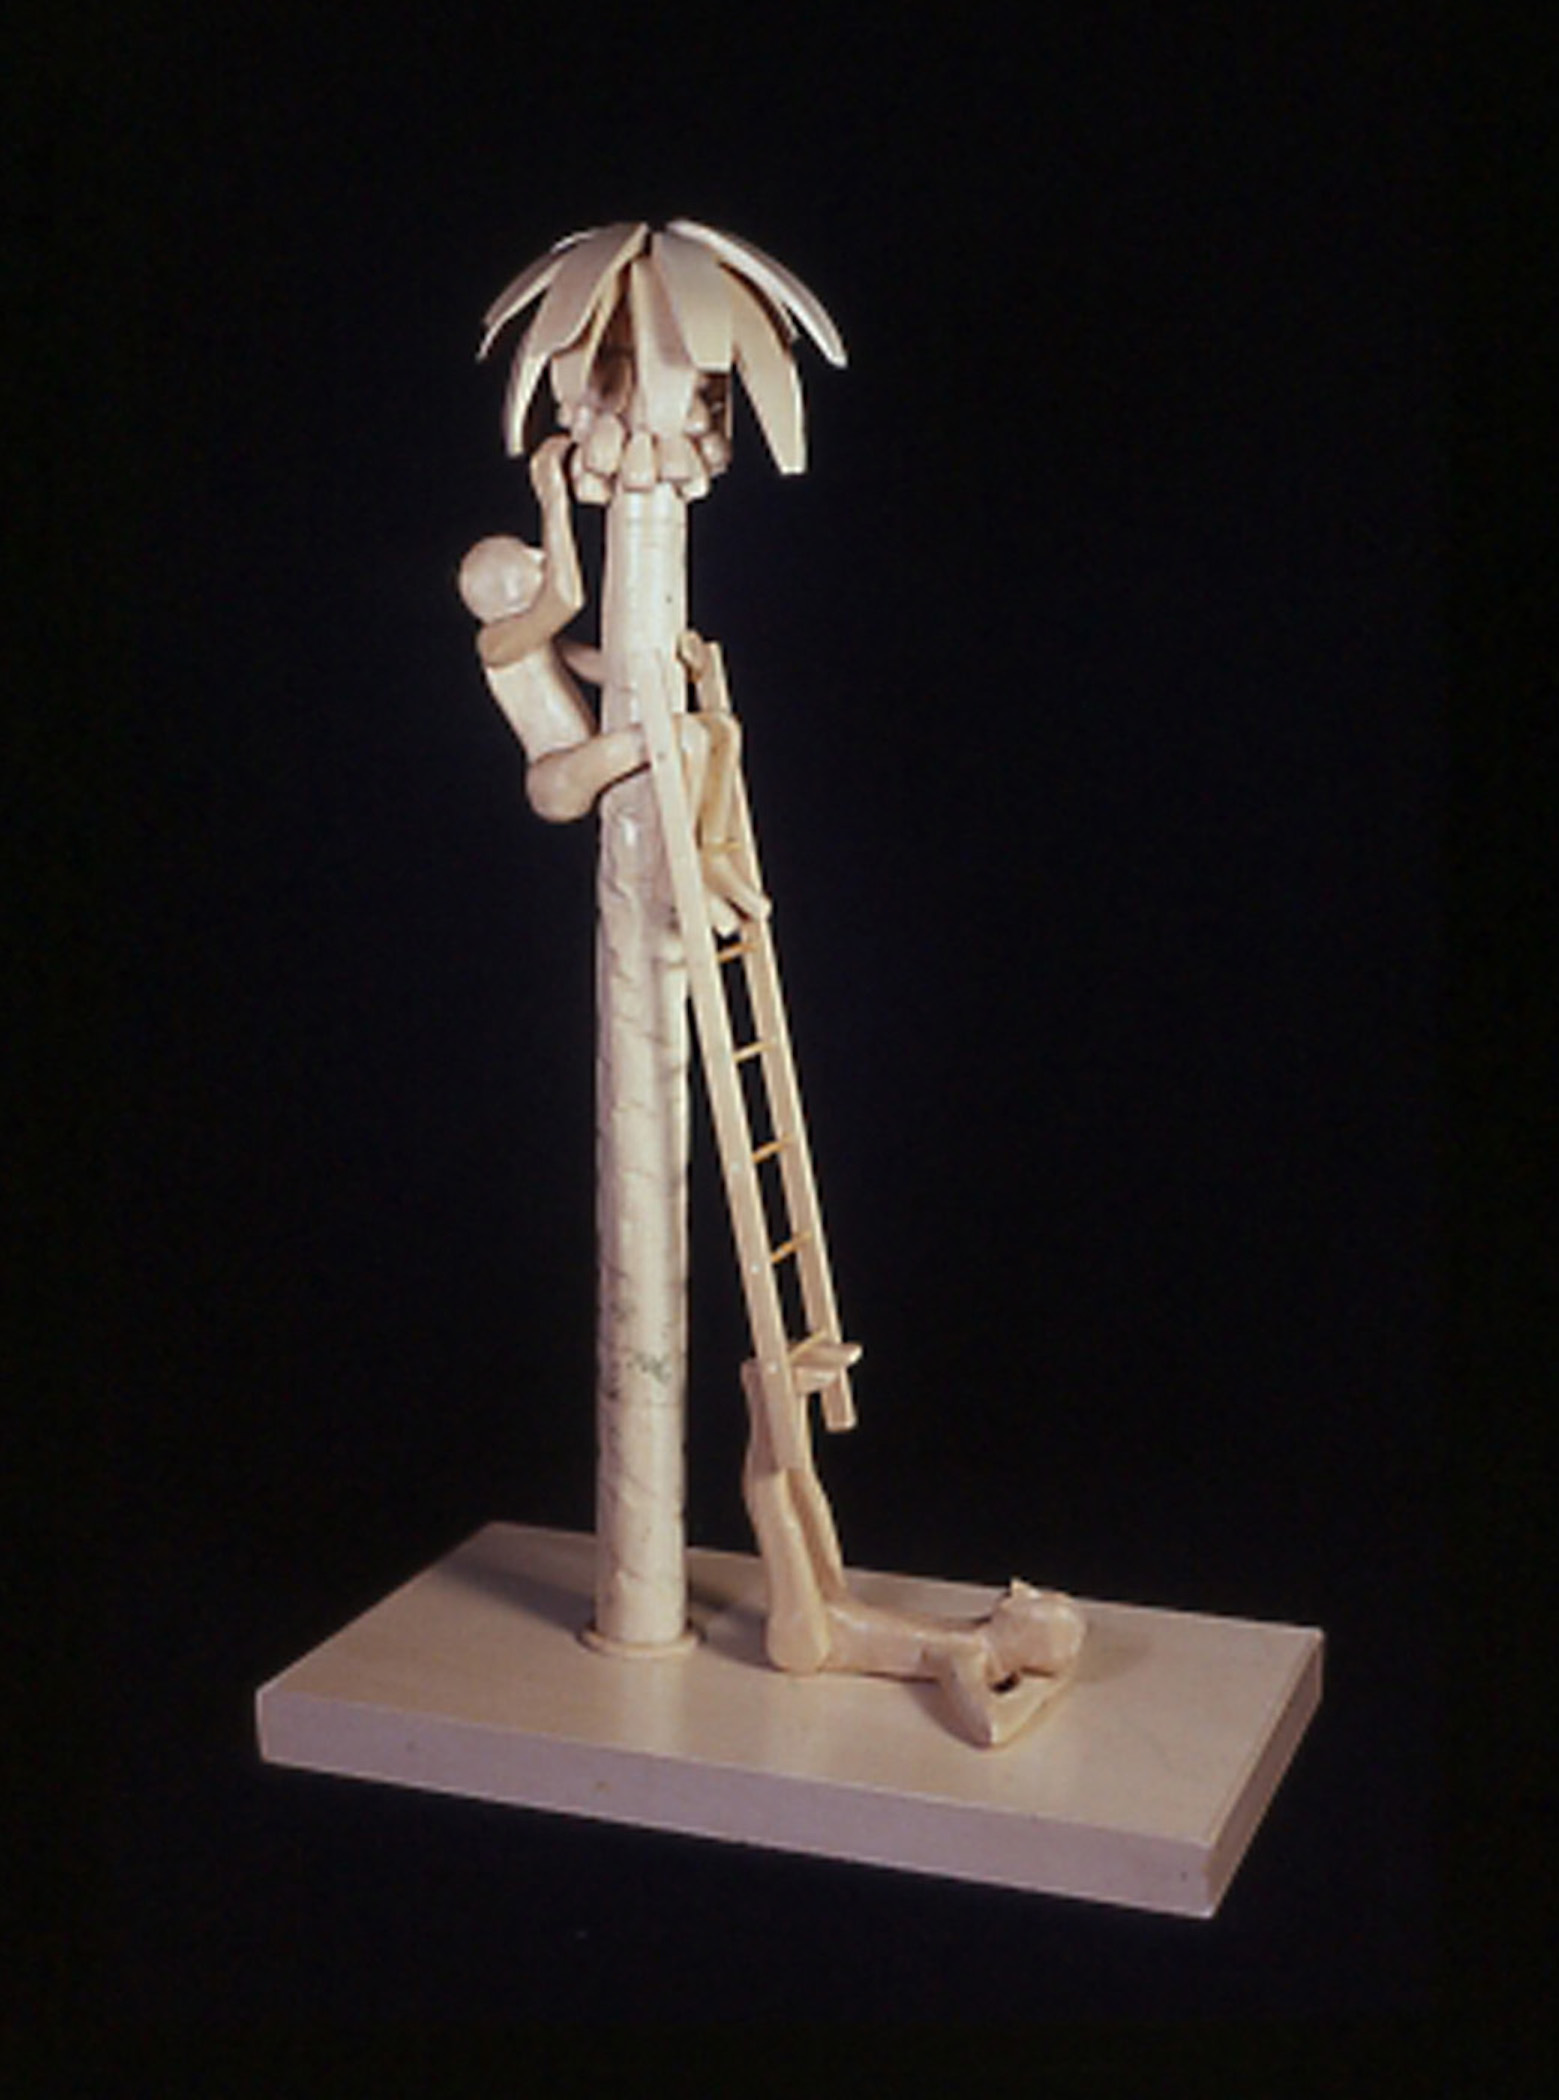 "Man Helping, 2002, pine wood, 20 1/4 x 13 x 7 1/2"""